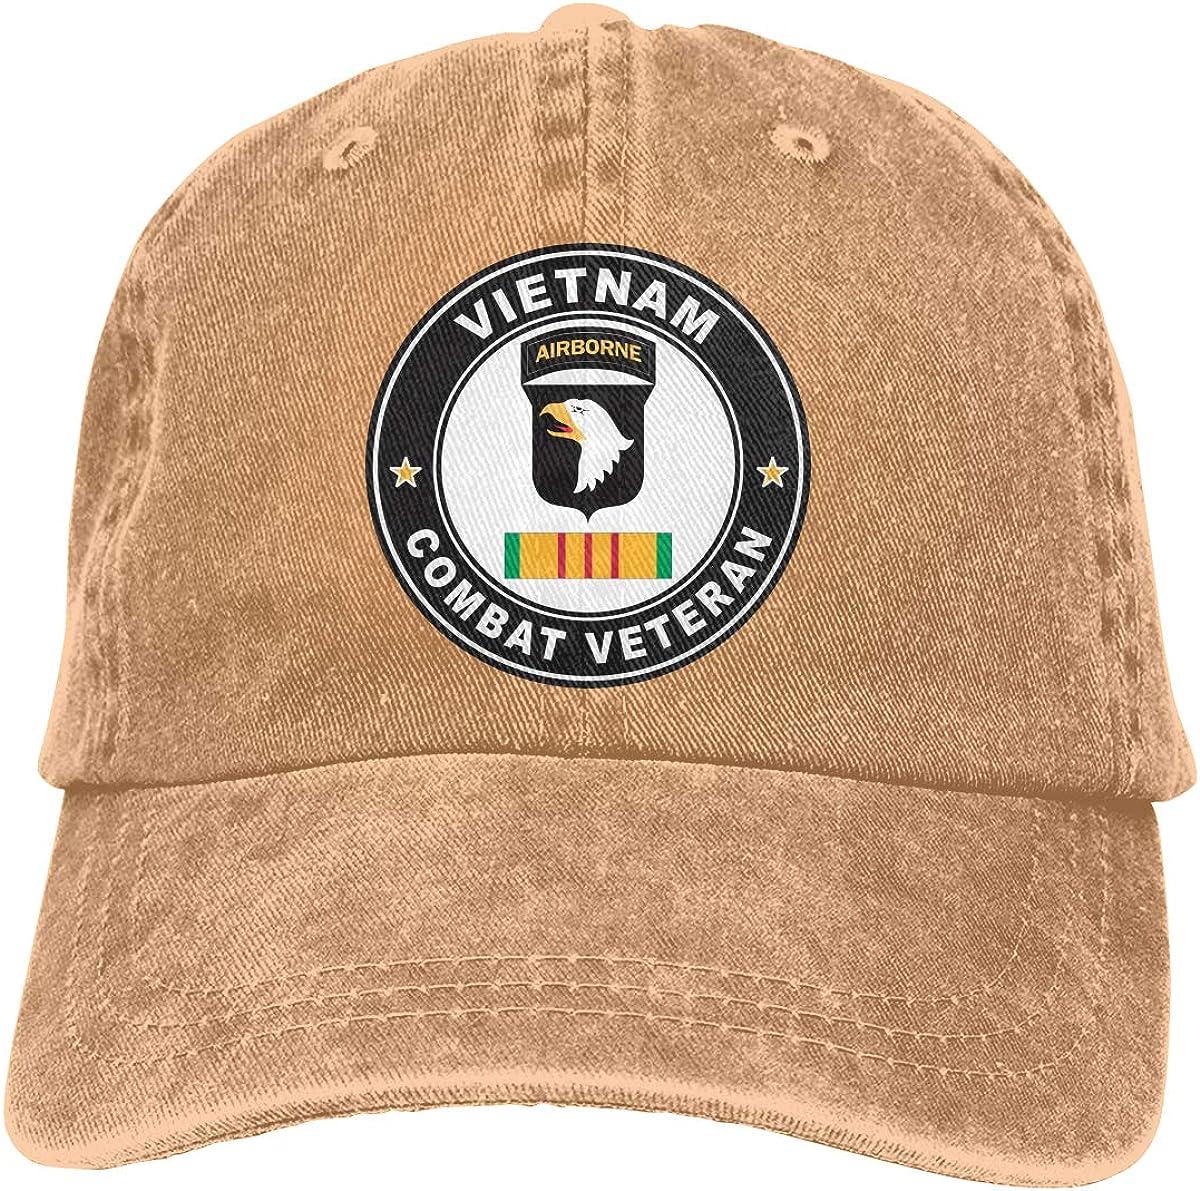 SLISL EIEI US Army 101st Airborne Division Vietnam Combat Veteran Adjustable Baseball Caps Denim Hats Cowboy Sport Outdoor